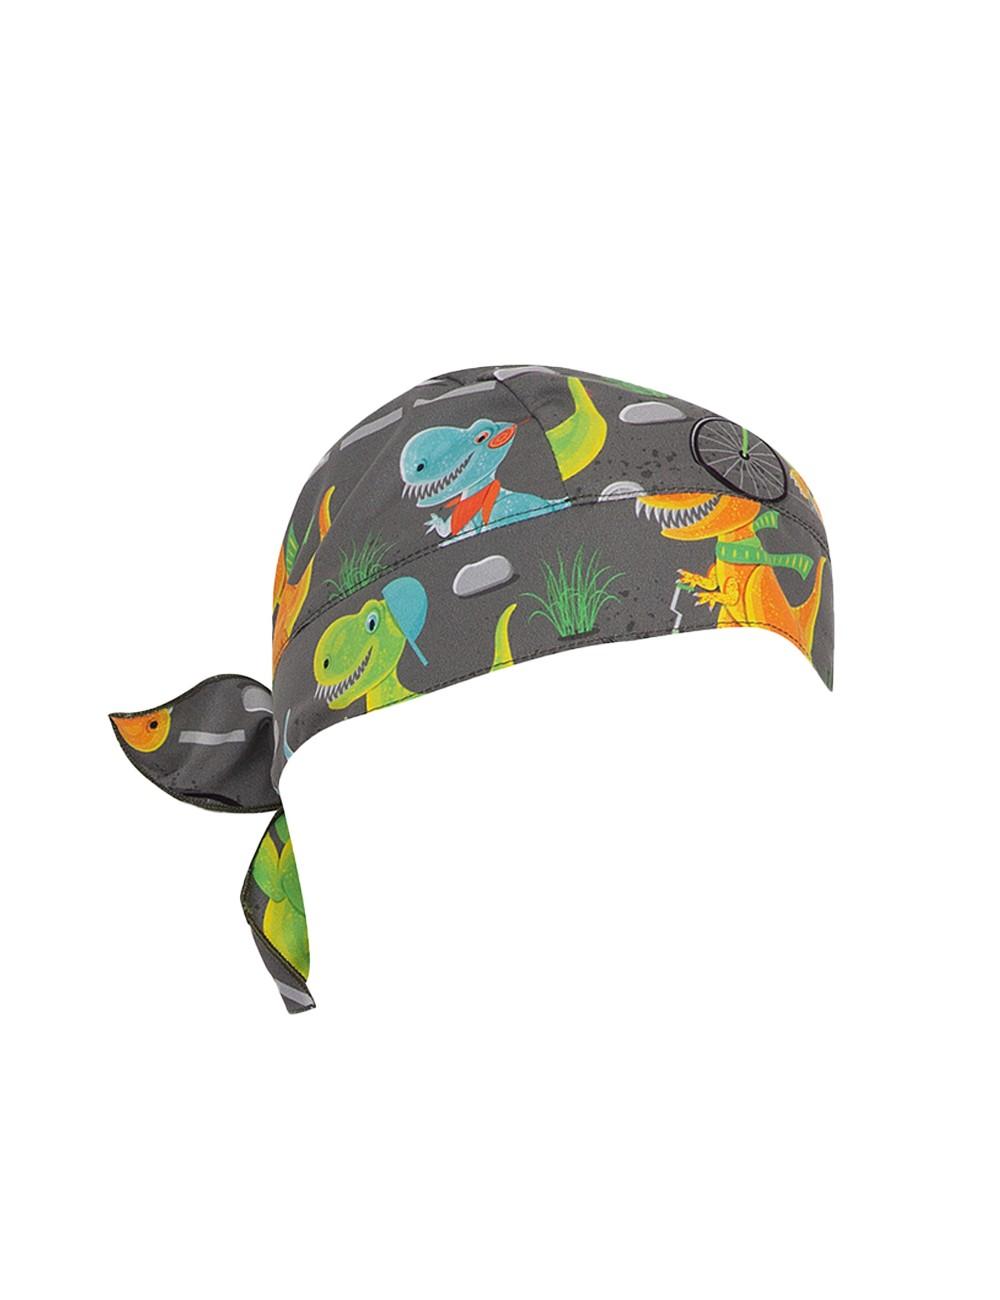 Tortue Καπέλο Μπαντάνα για Αγόρια Tortue S1-147-031 Lamoda.gr